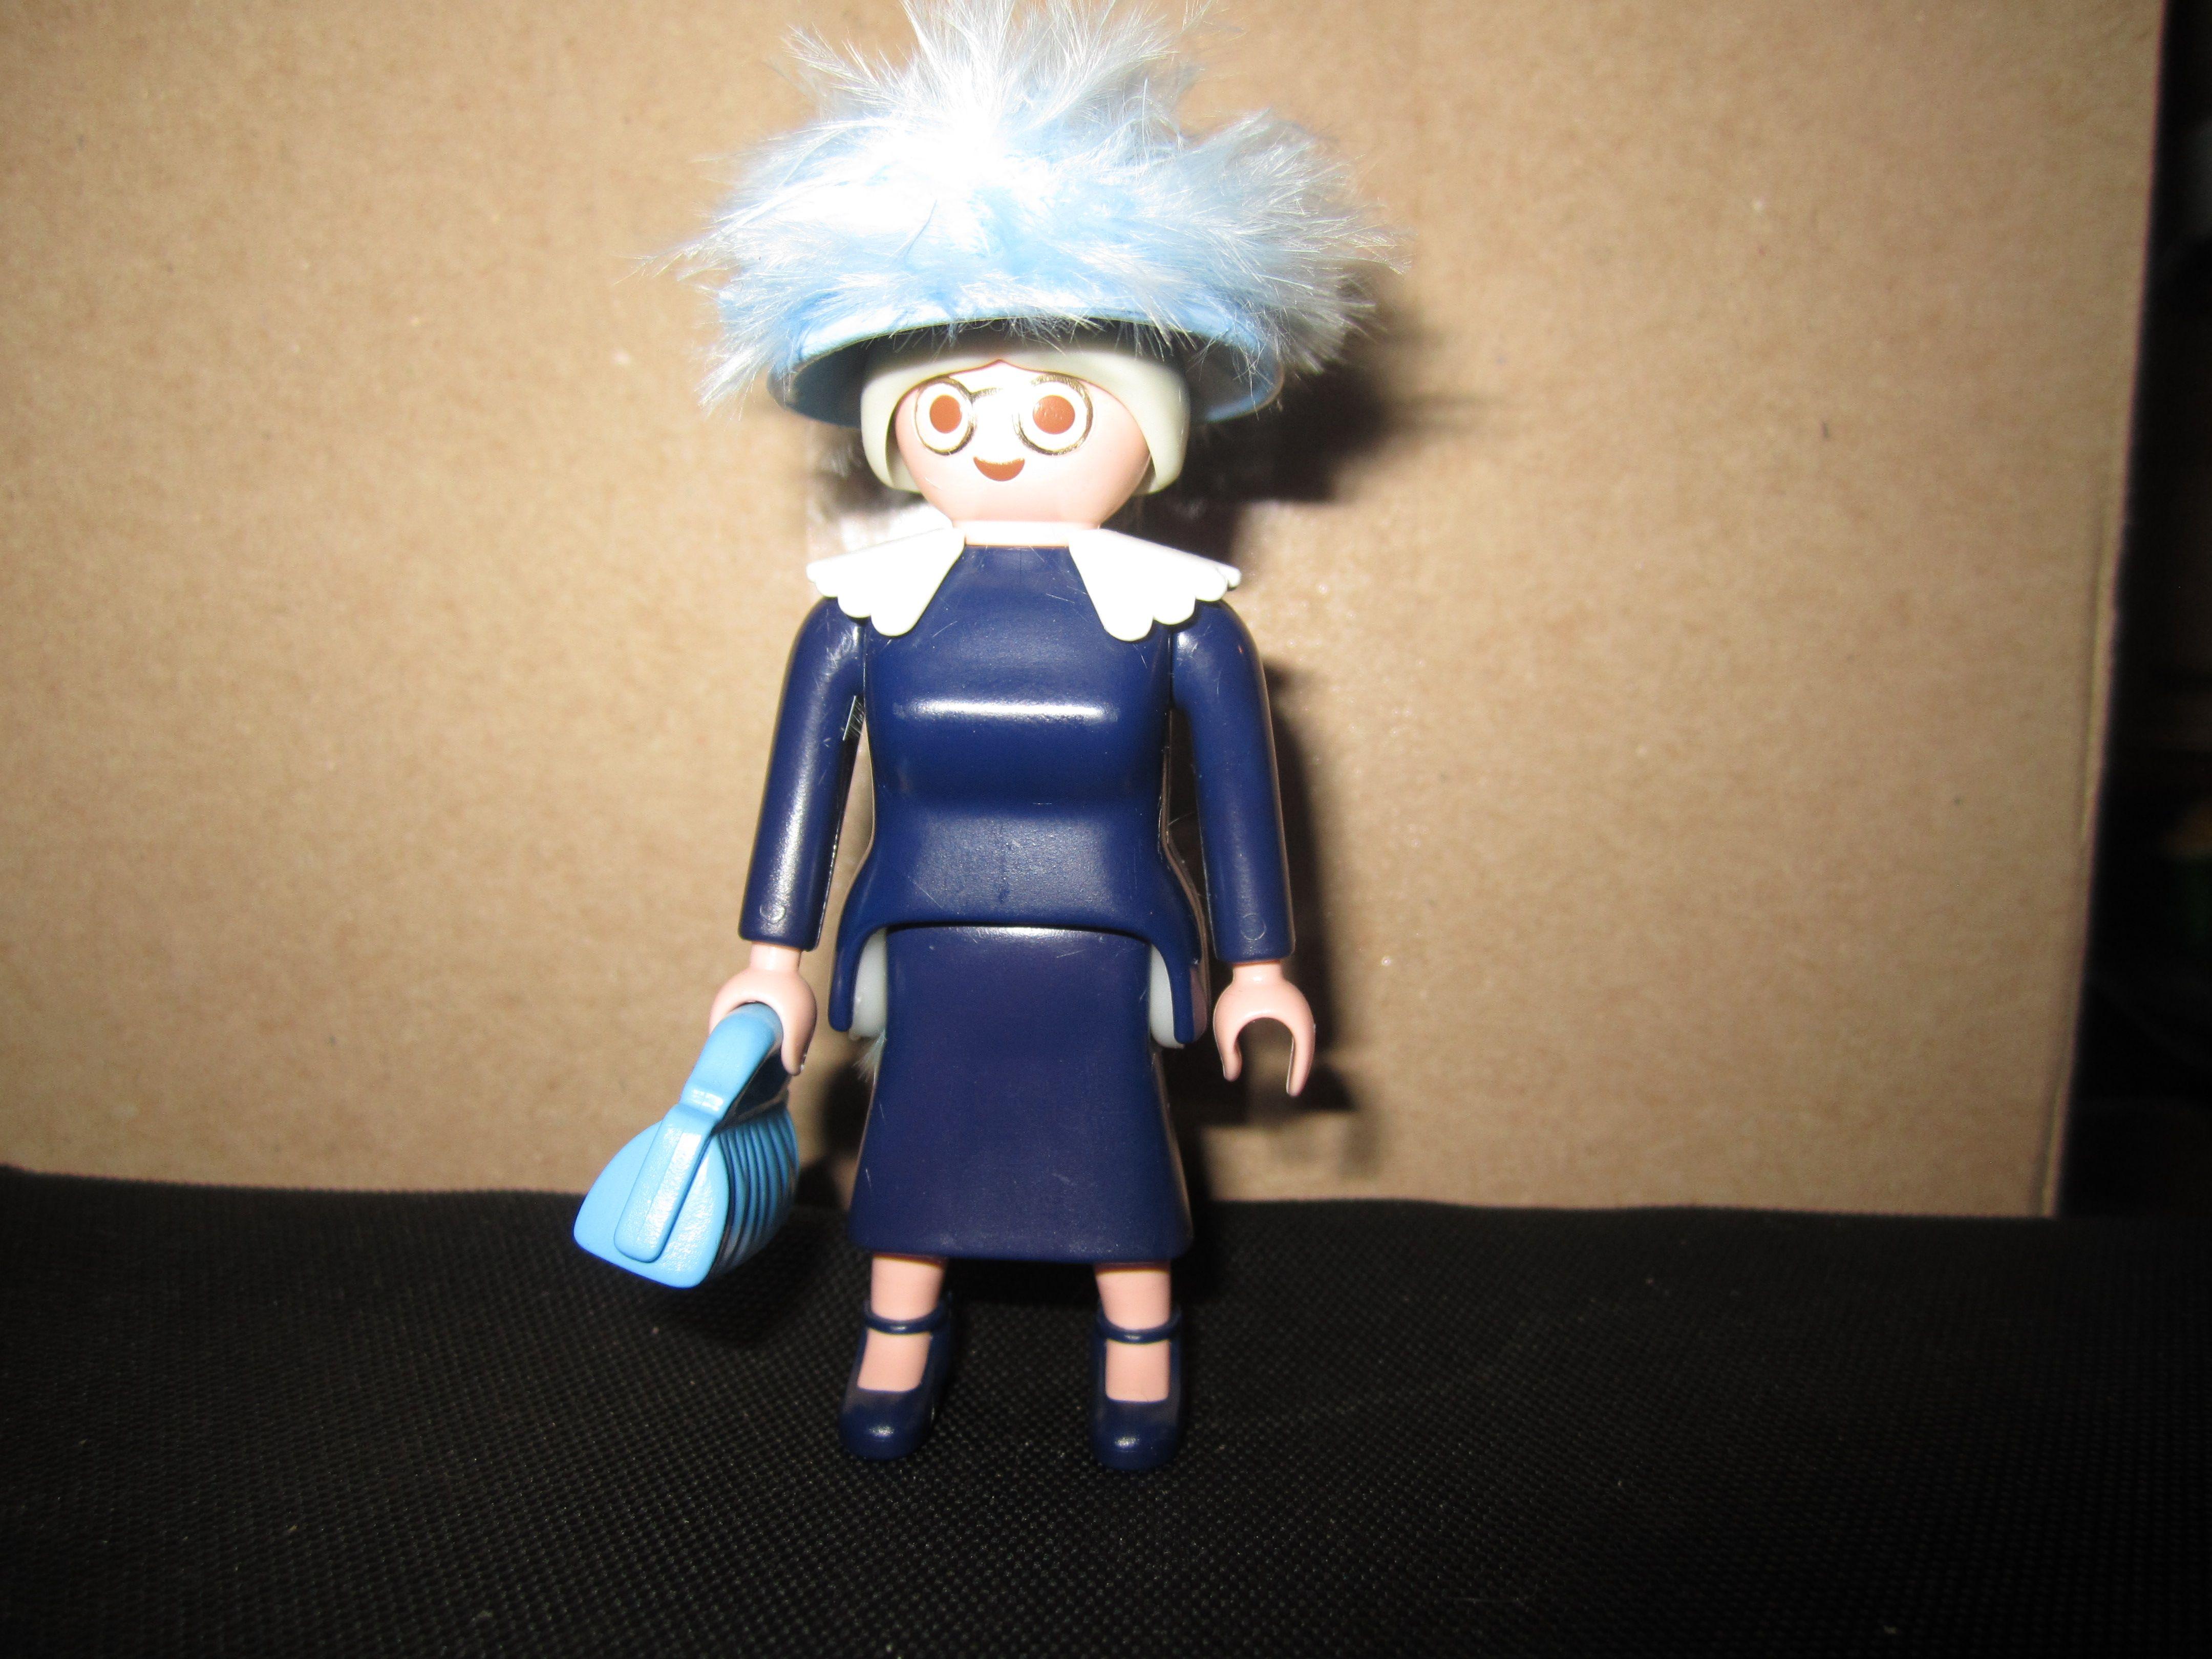 Pin von Marlene Obermeier auf Playmobil | Playmobil